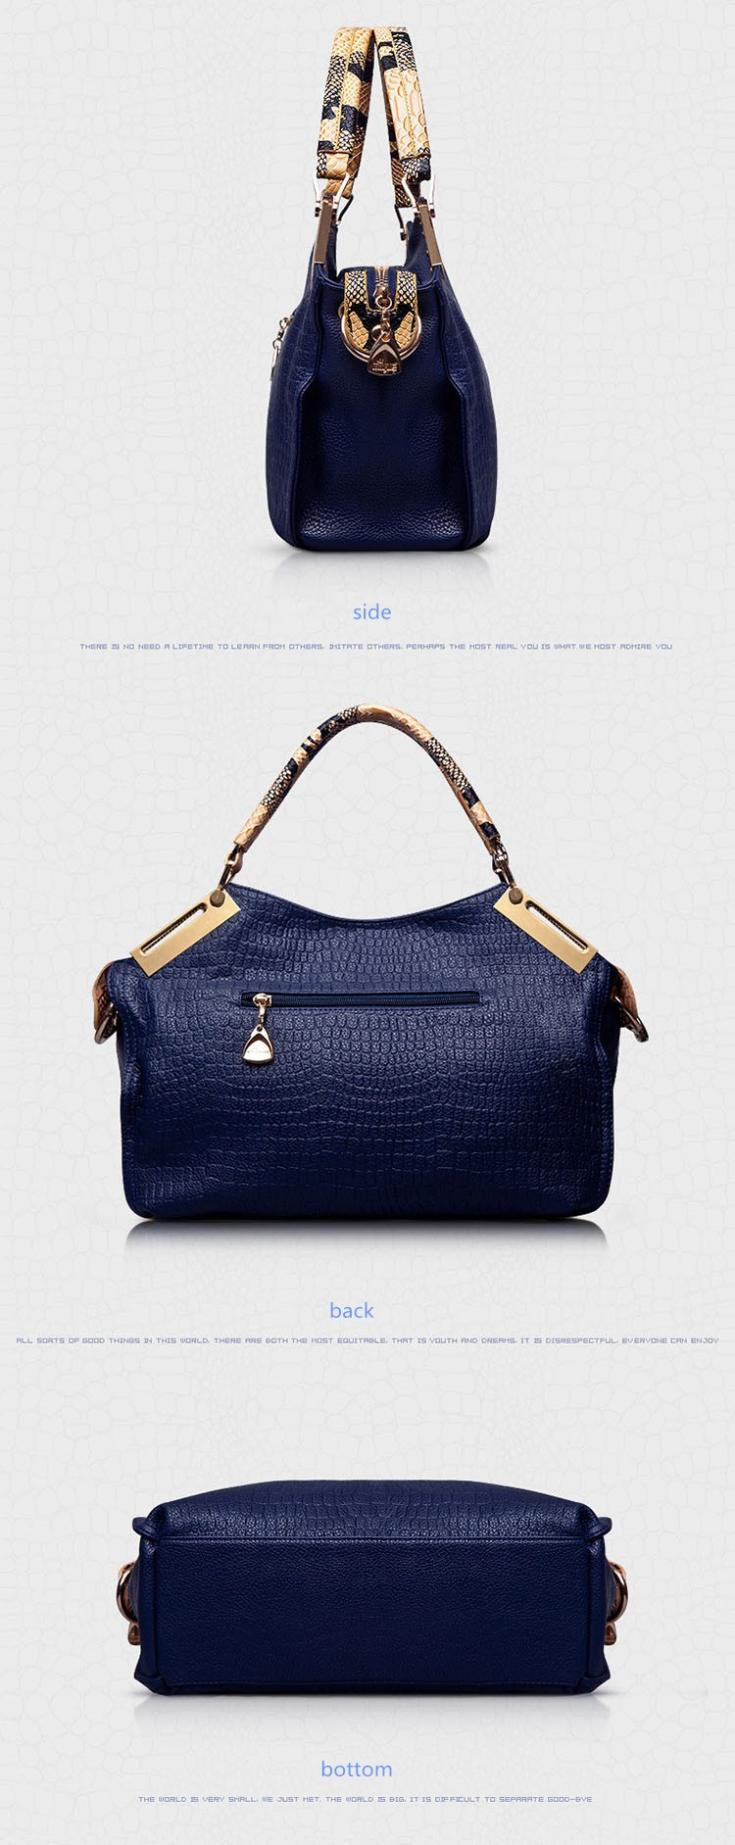 56eab67d356 Detail Feedback Questions about 2018 New ashion women handbag ...